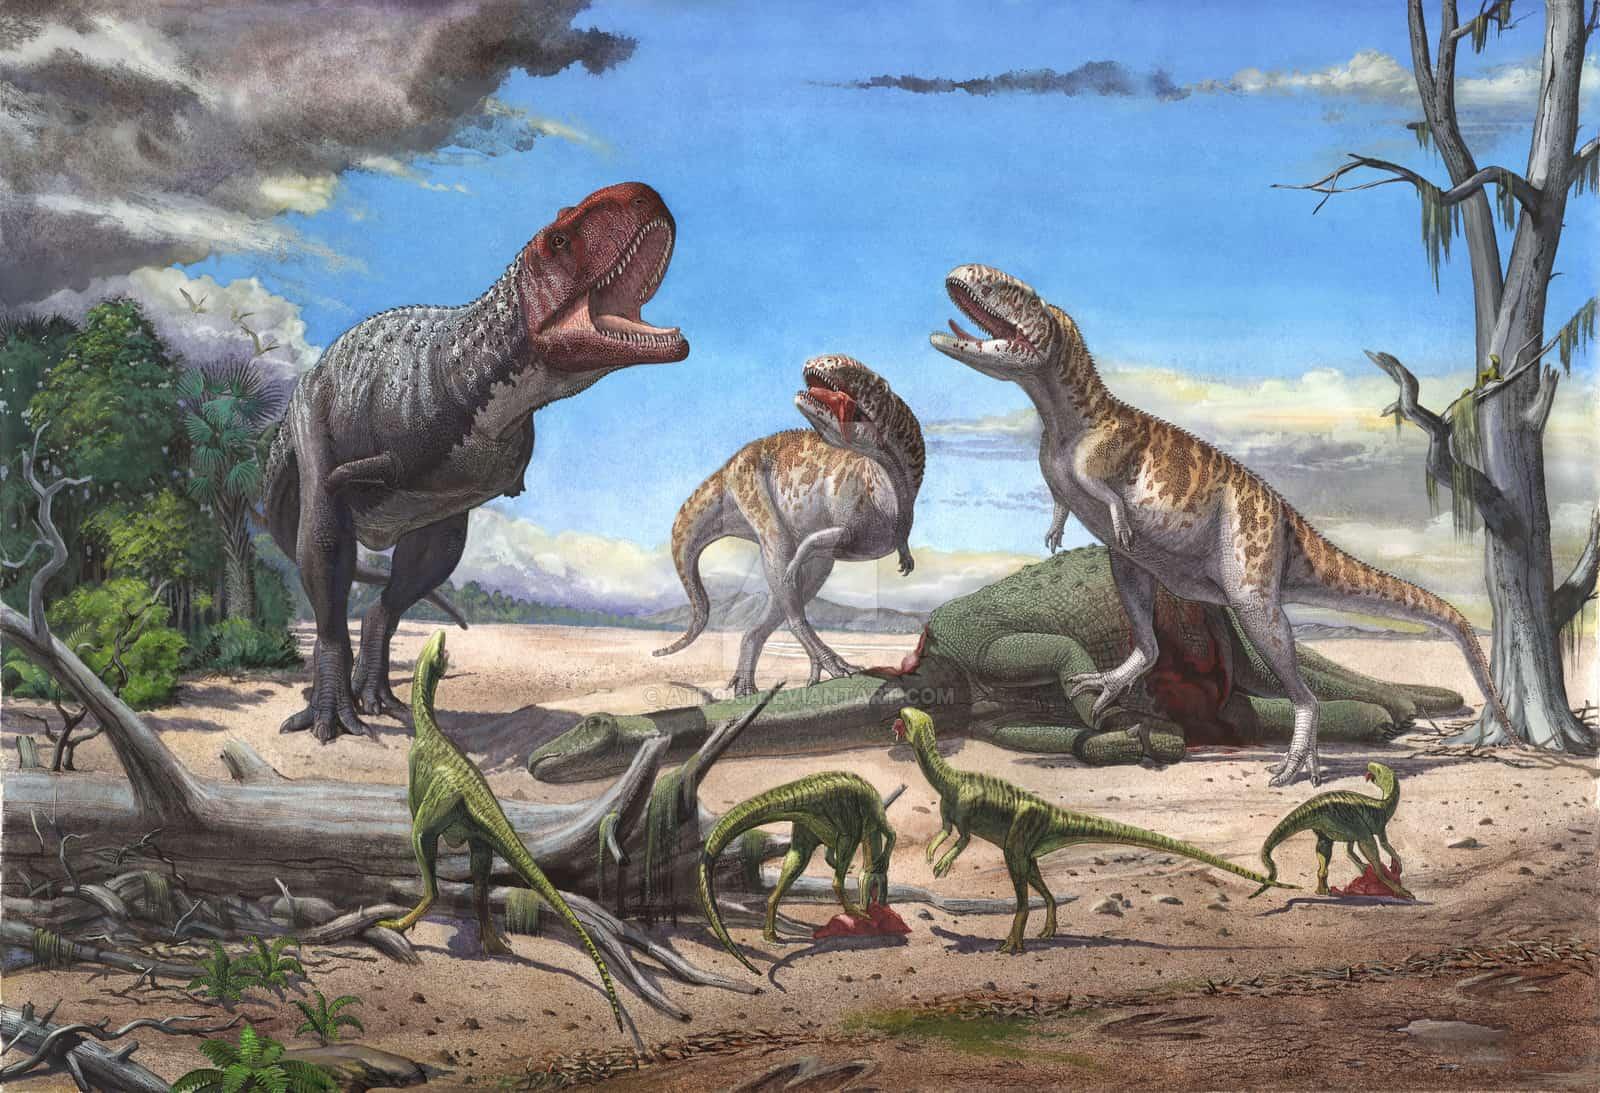 Rajasaurus by Sergey Krasovskiy